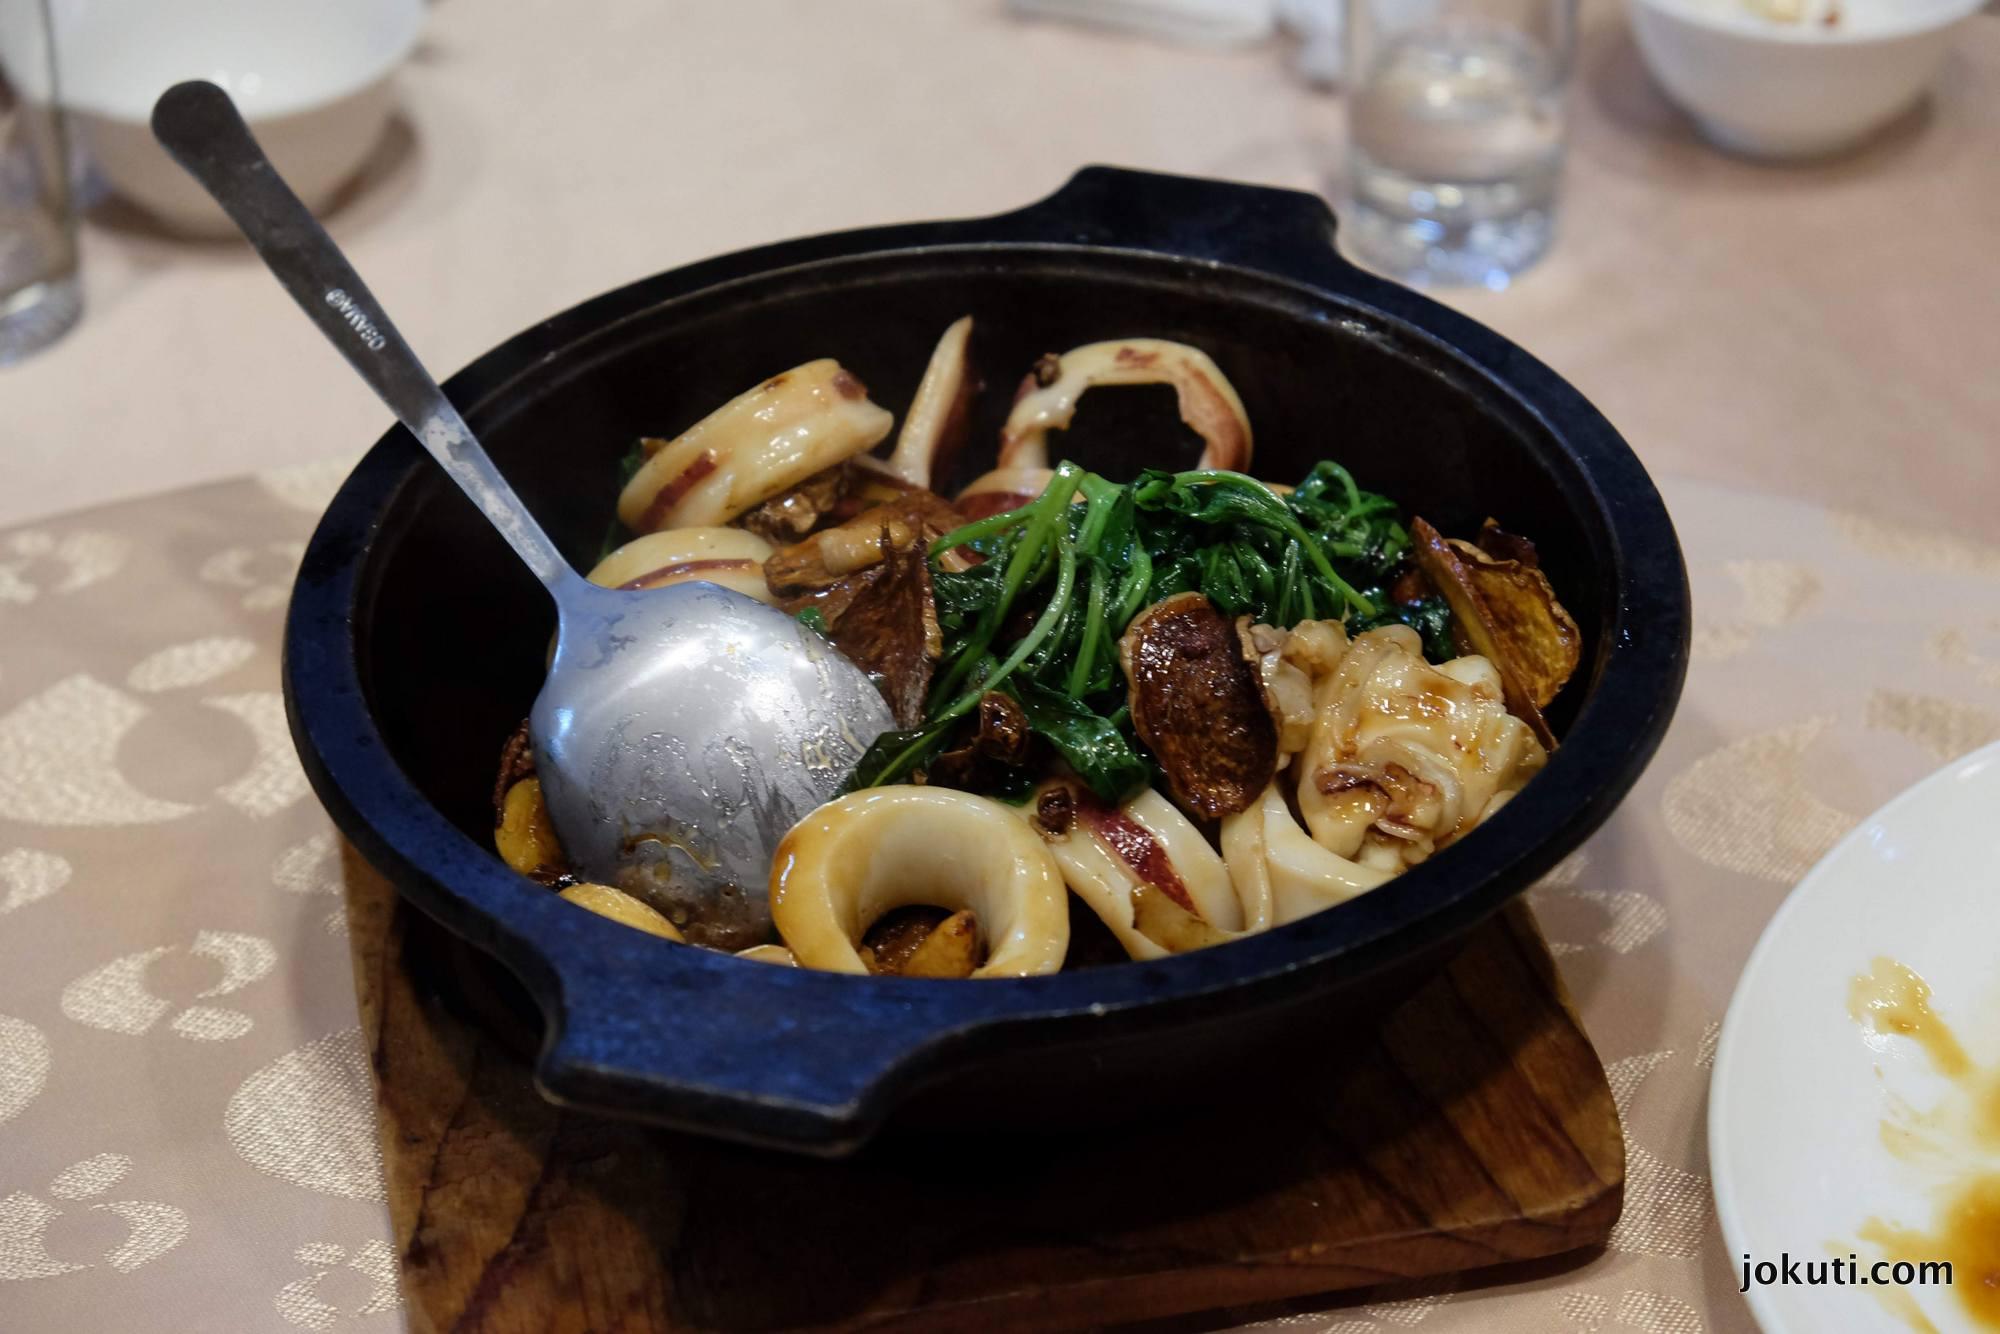 dscf2924_taipei_ming_fu_seafood_michelin_taiwan_vilagevo_jokuti.jpg